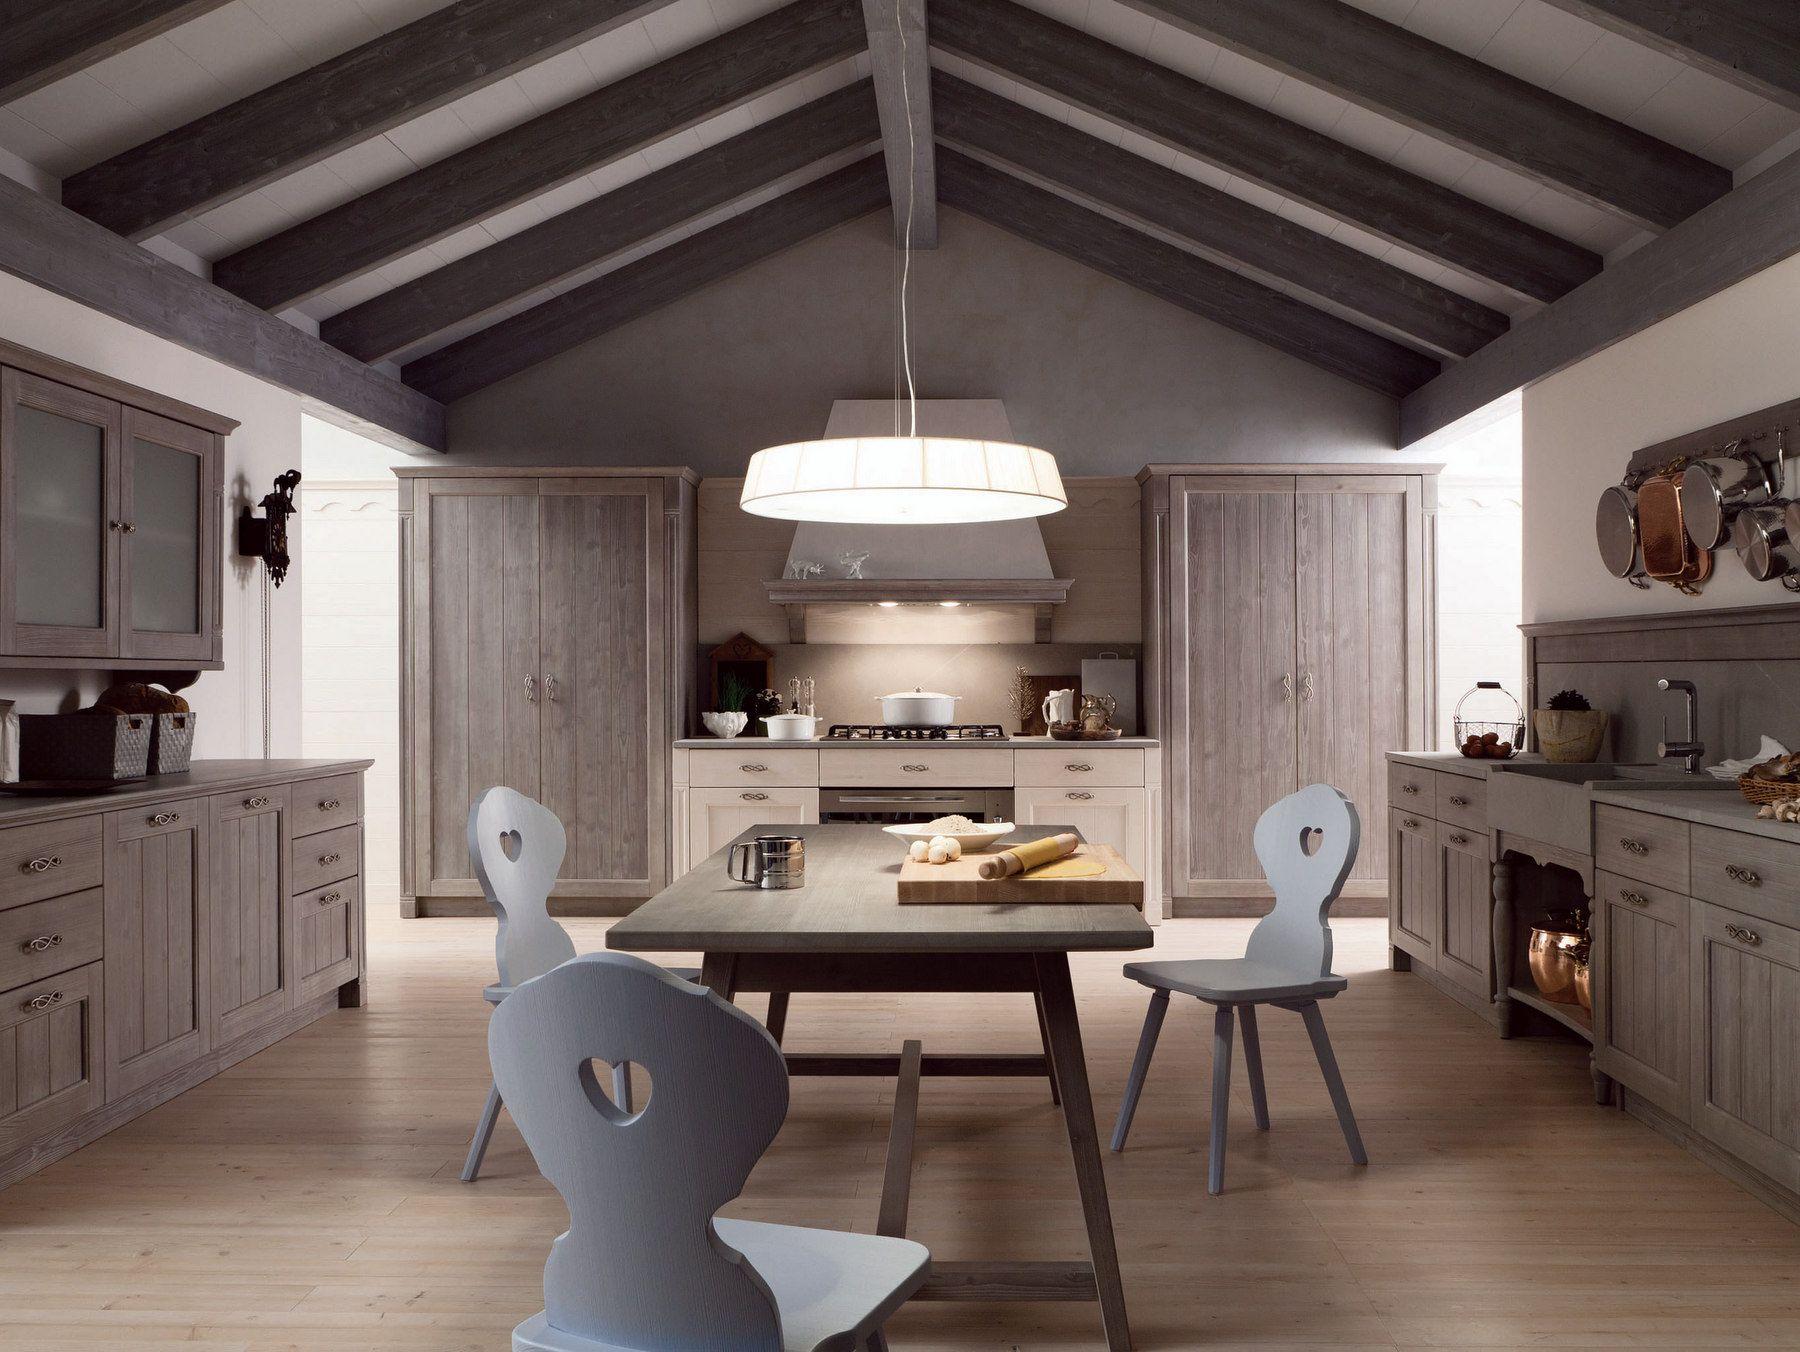 Cucina lineare in stile rustico tabi t03 by scandola mobili - Cucine ikea country ...